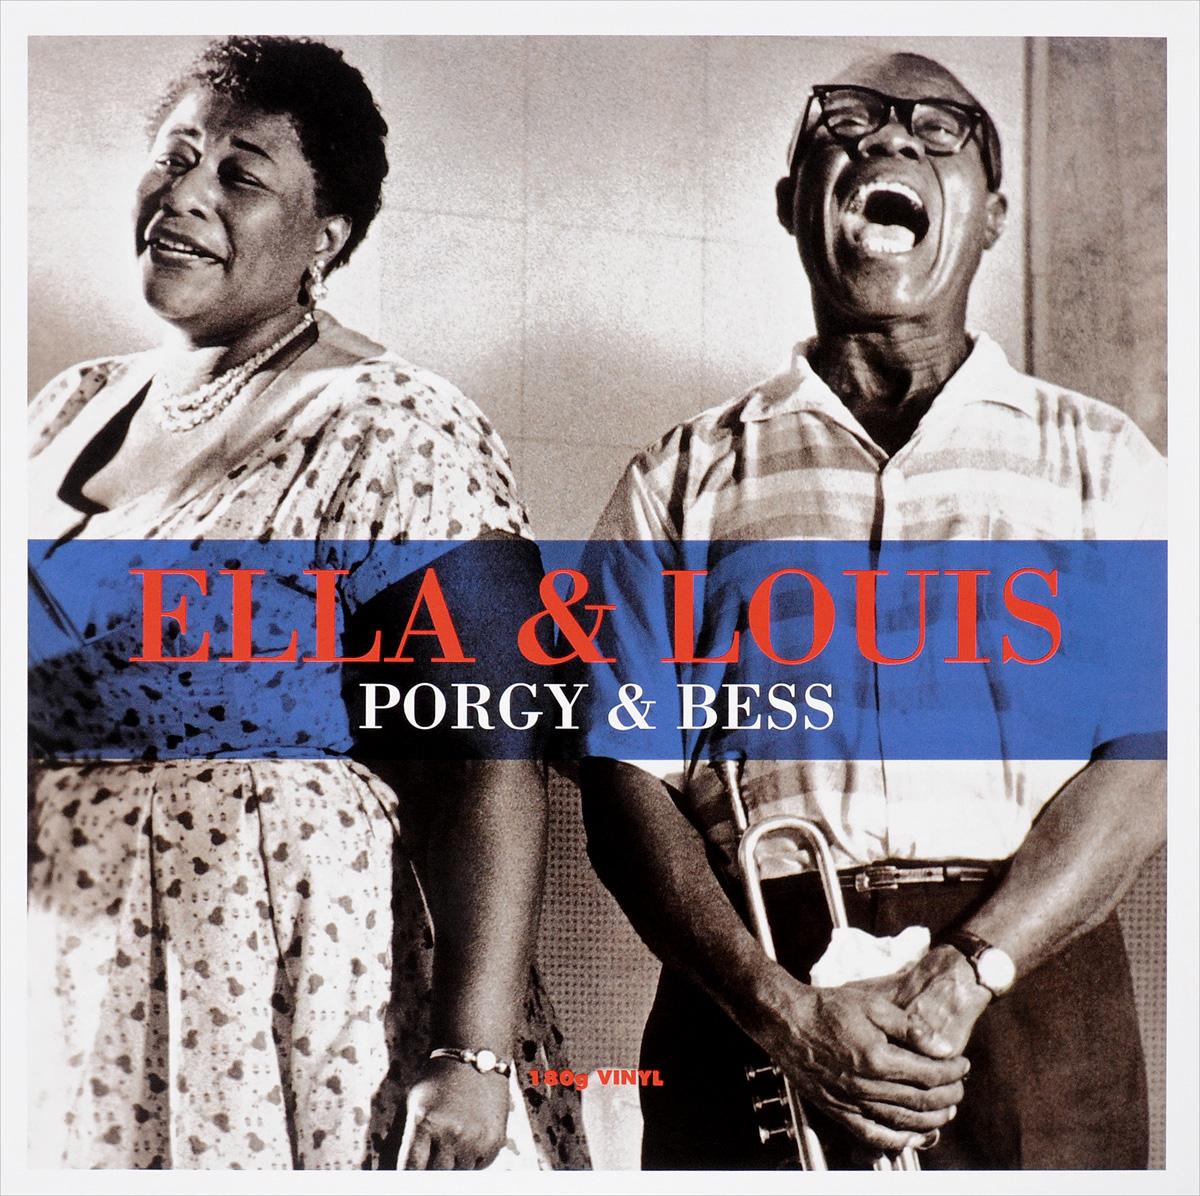 цена на Элла Фитцжеральд Ella Fitzgerald And Louis Armstrong. Porgy & Bess (LP)